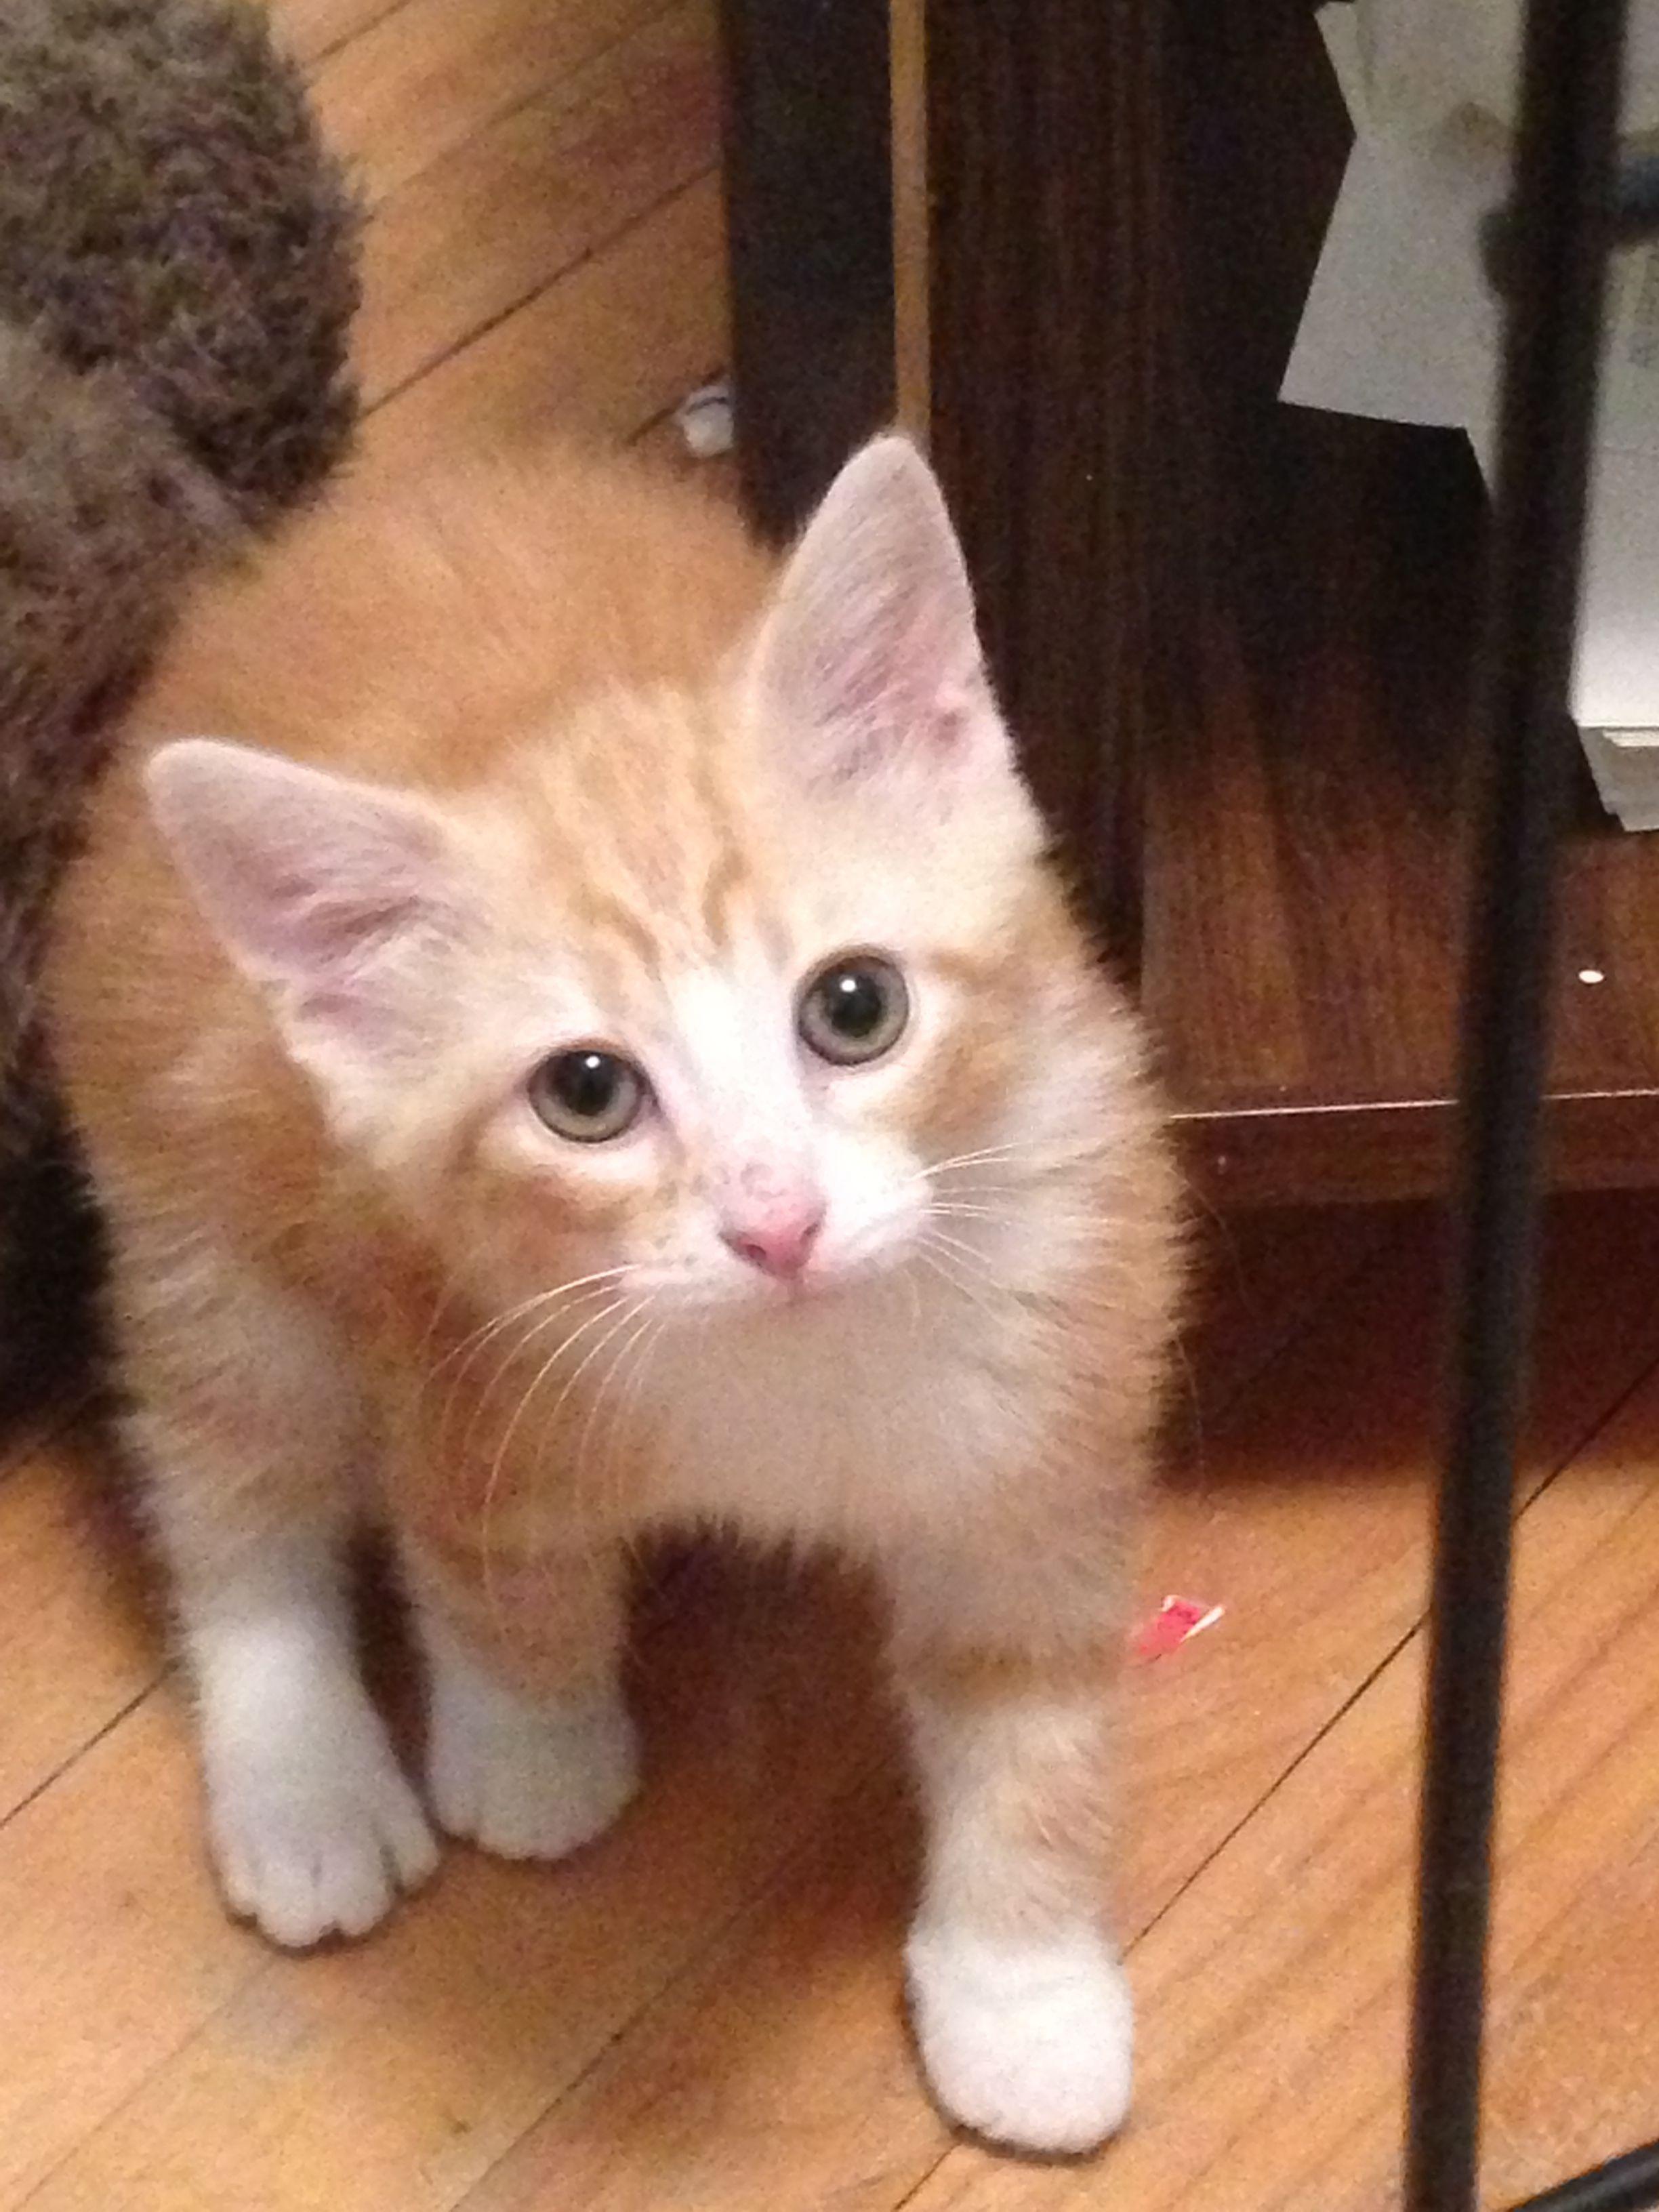 Medium hair orange and white tabby :) 8 weeks old Finnigan!